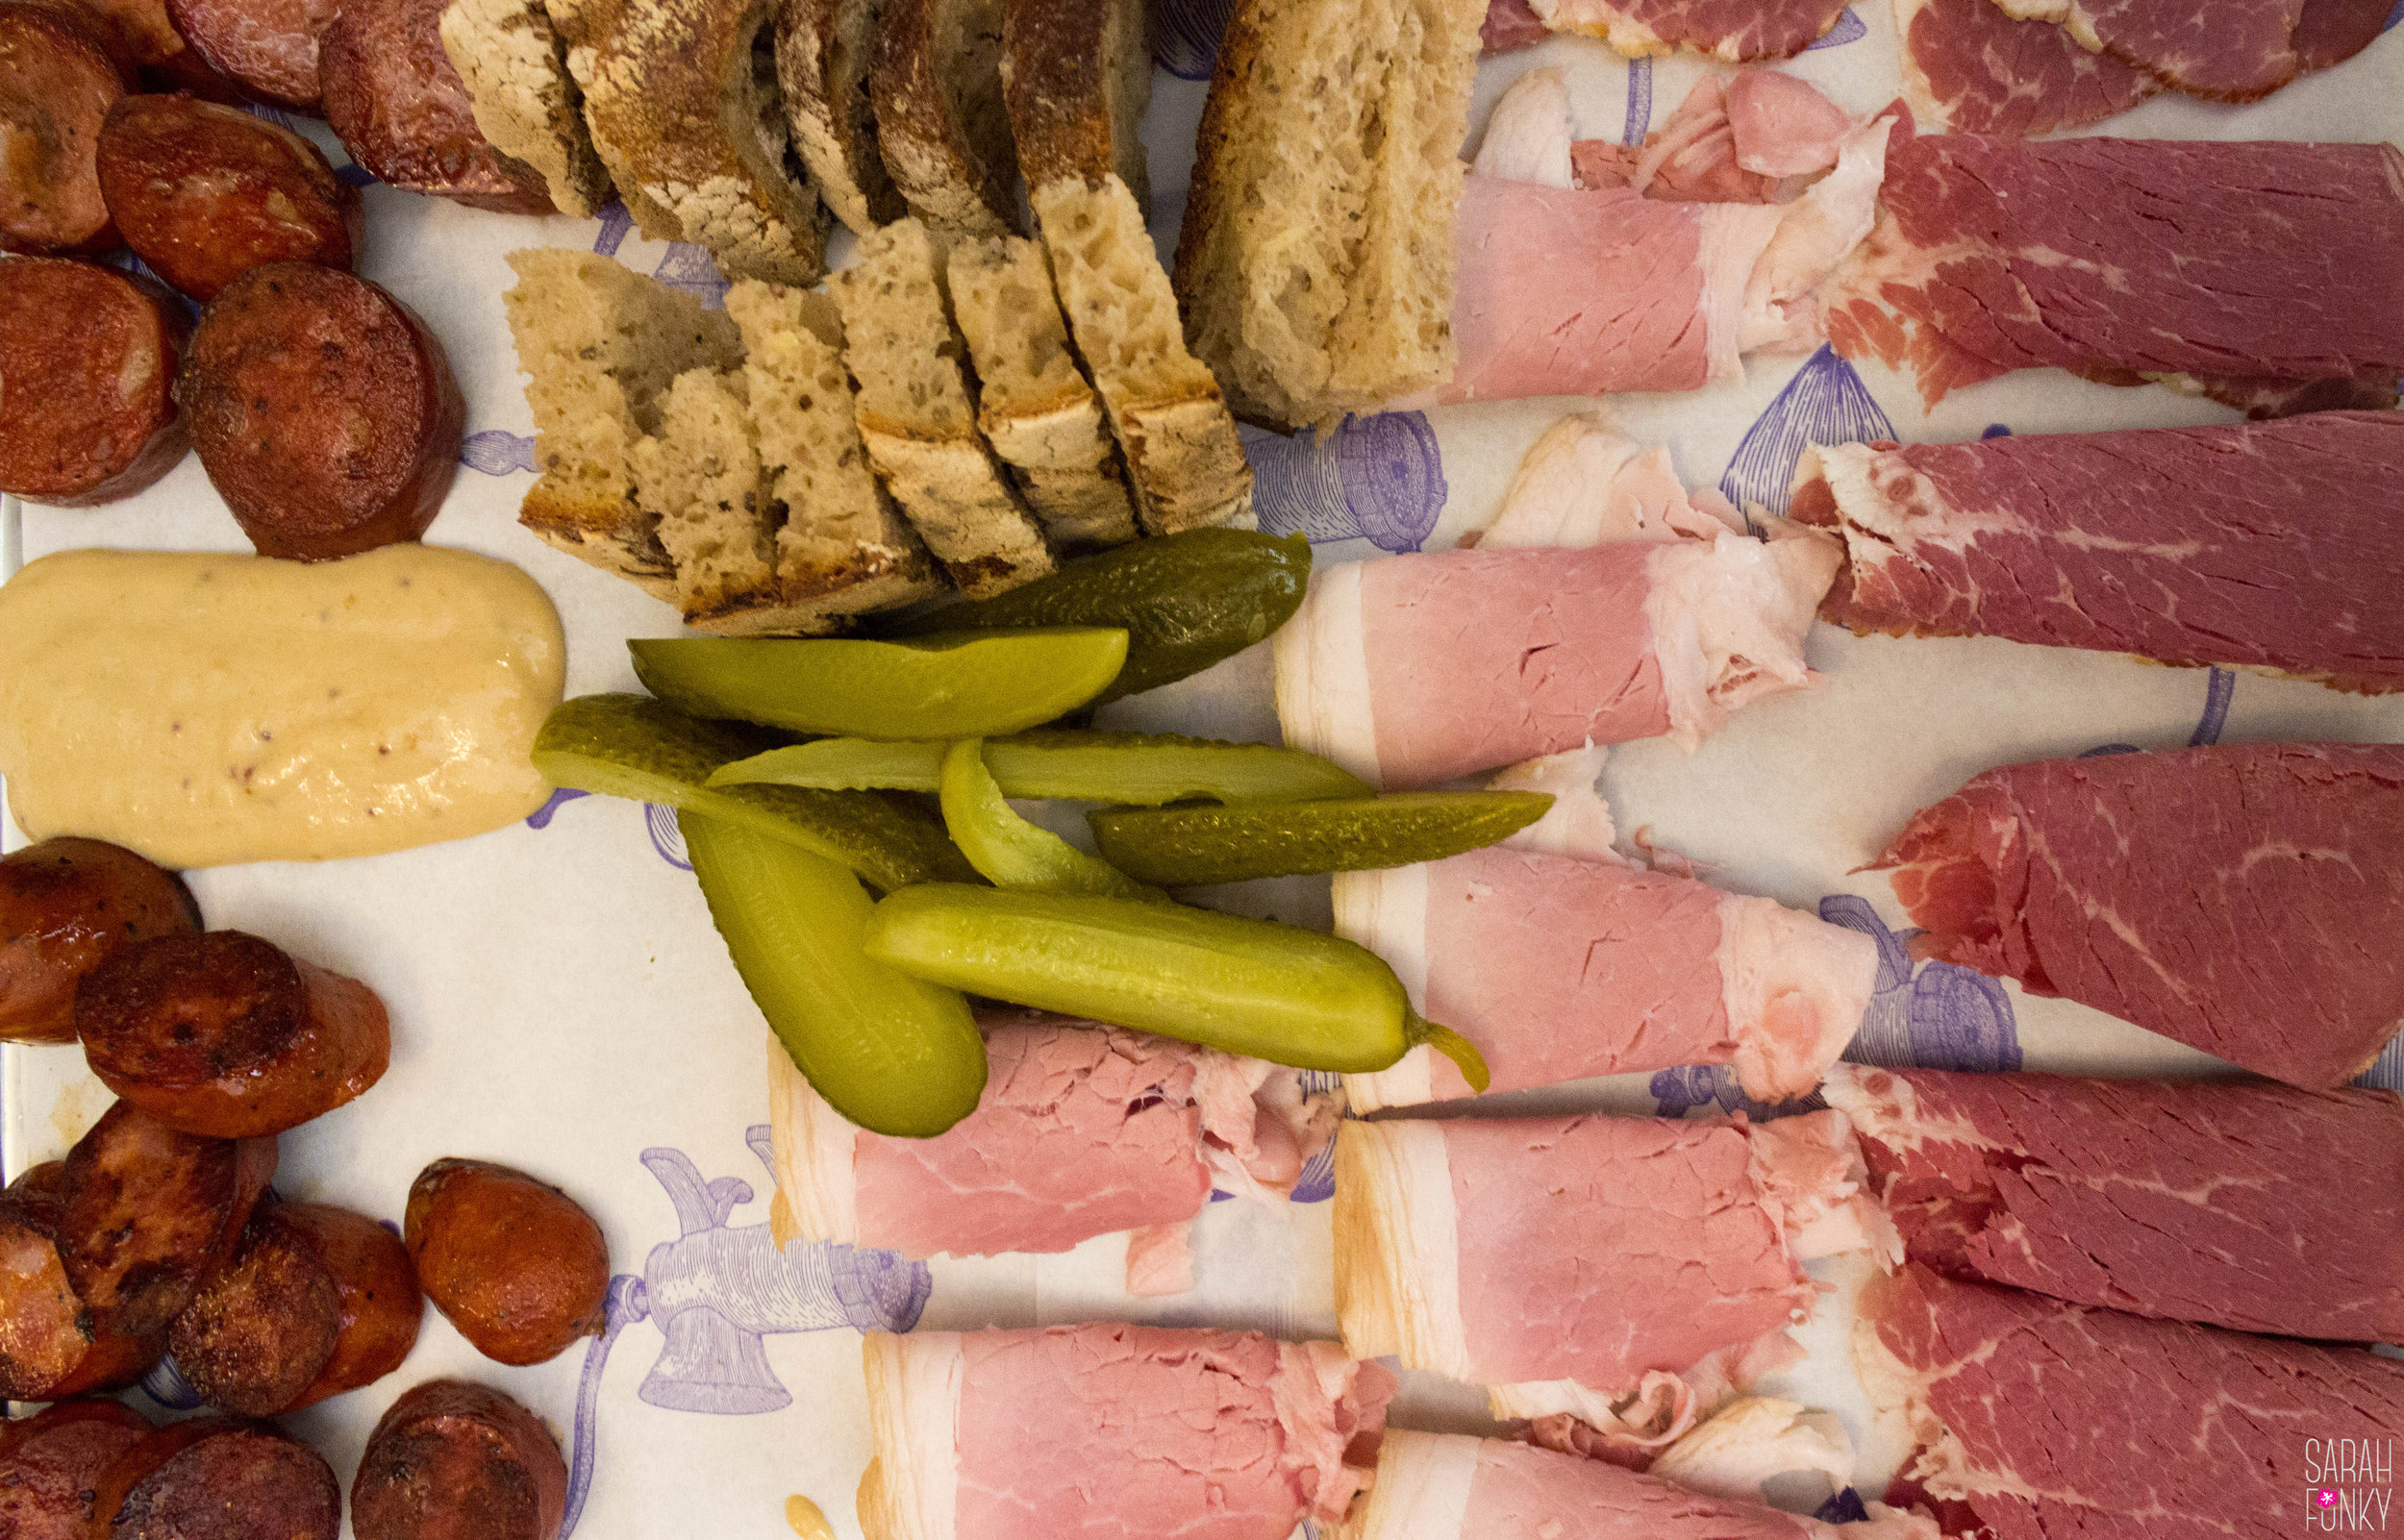 Prague ham and Prestice sausage at Nase Maso